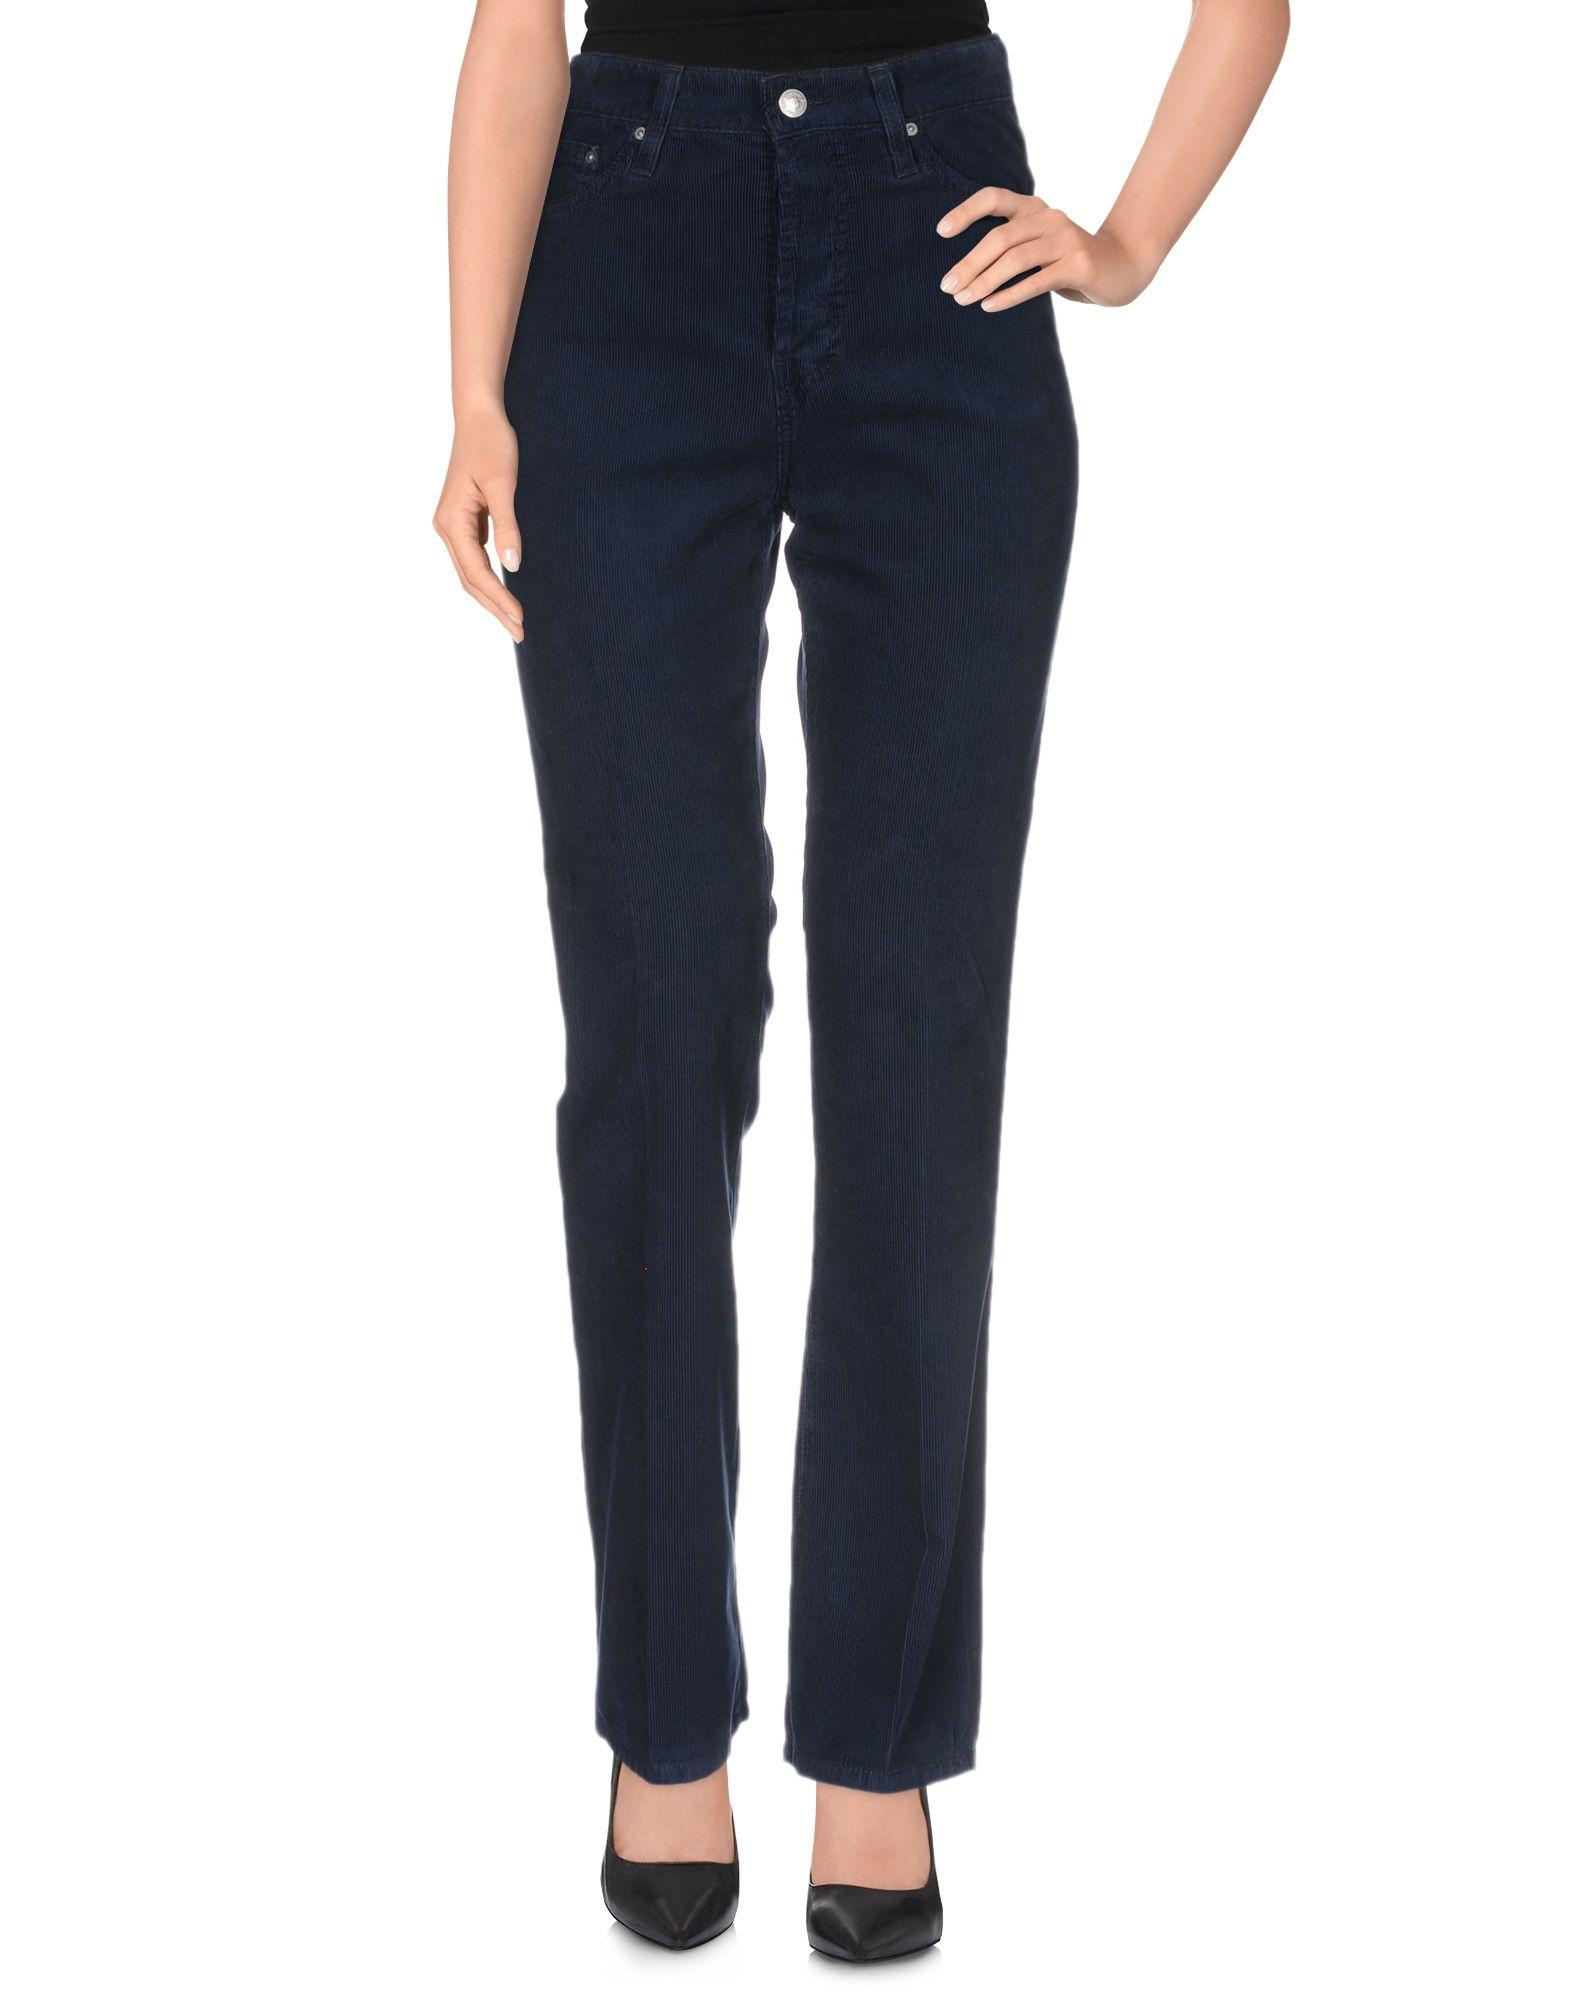 ALEXA CHUNG for AG Повседневные брюки